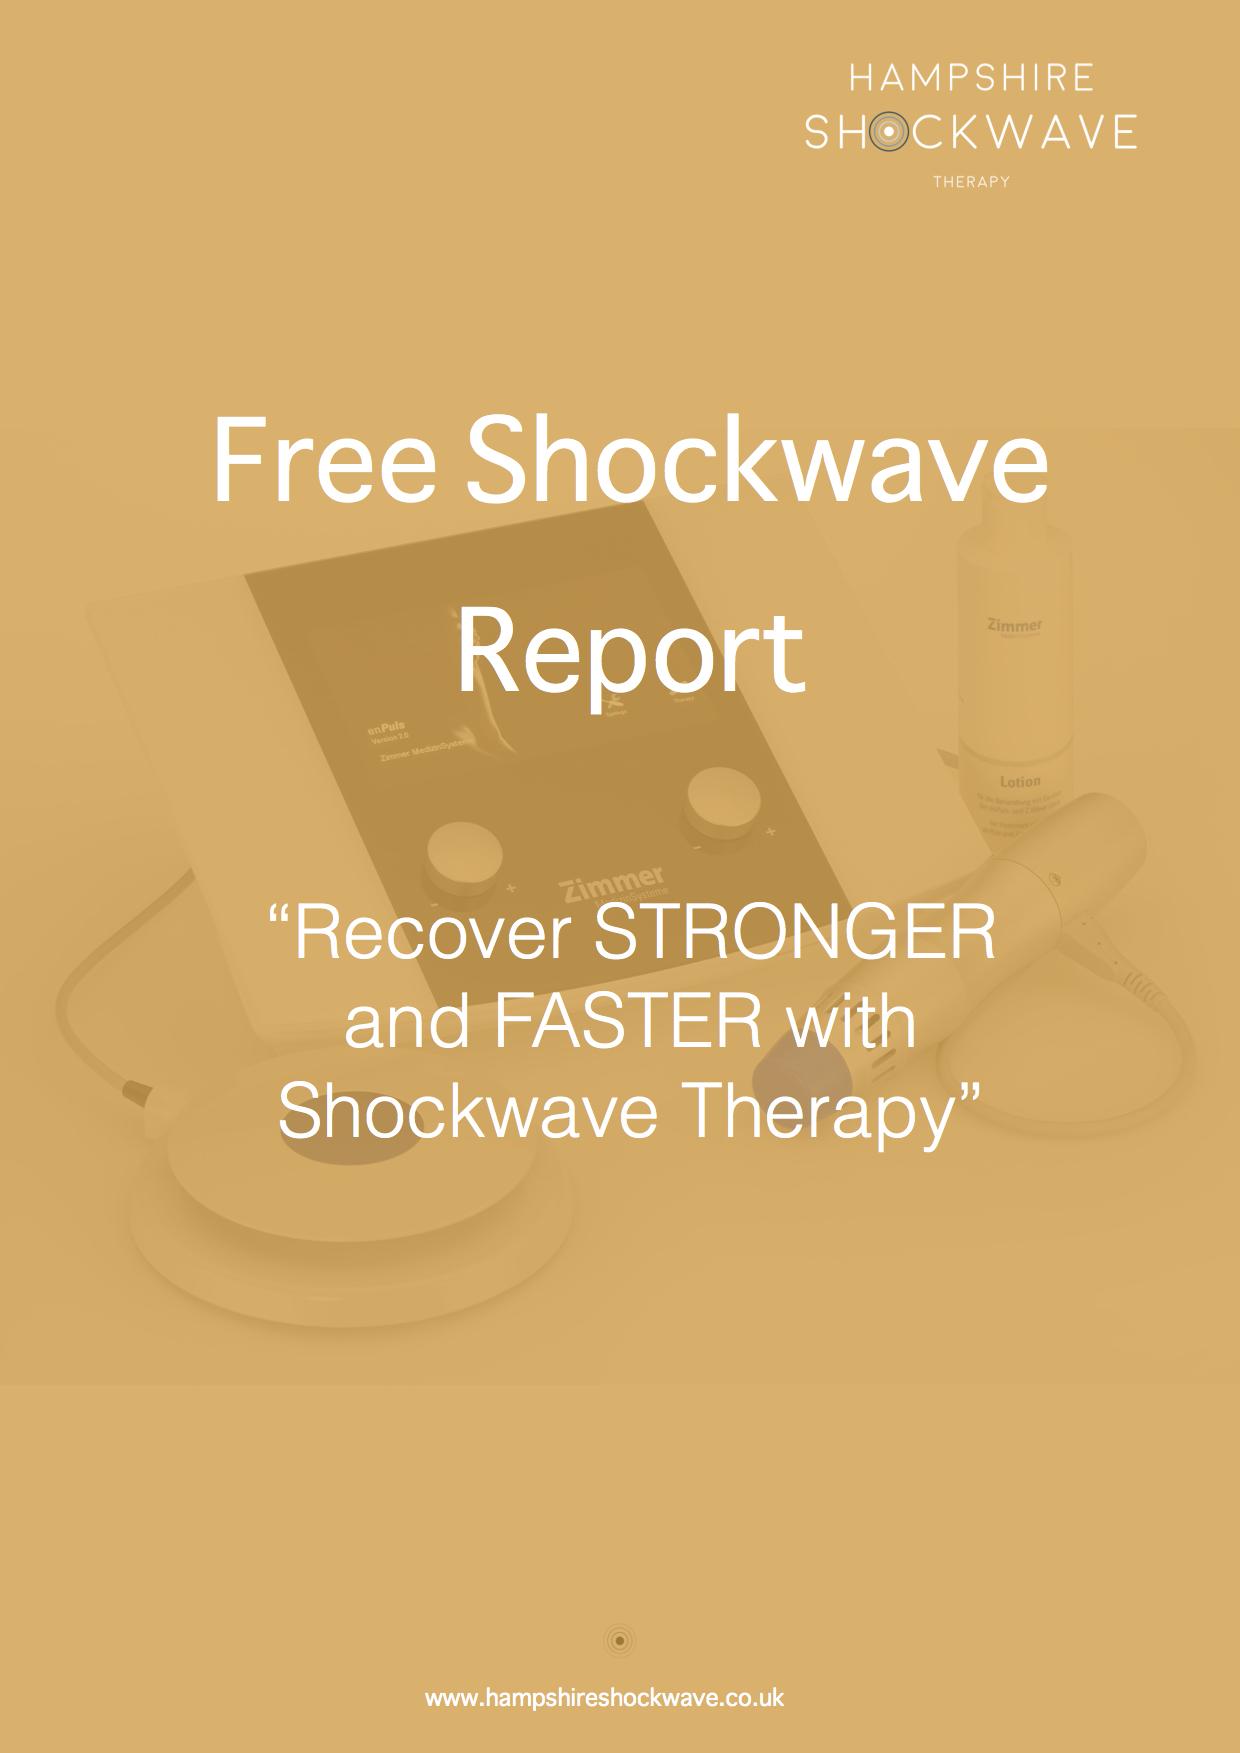 Free Shockwave Report